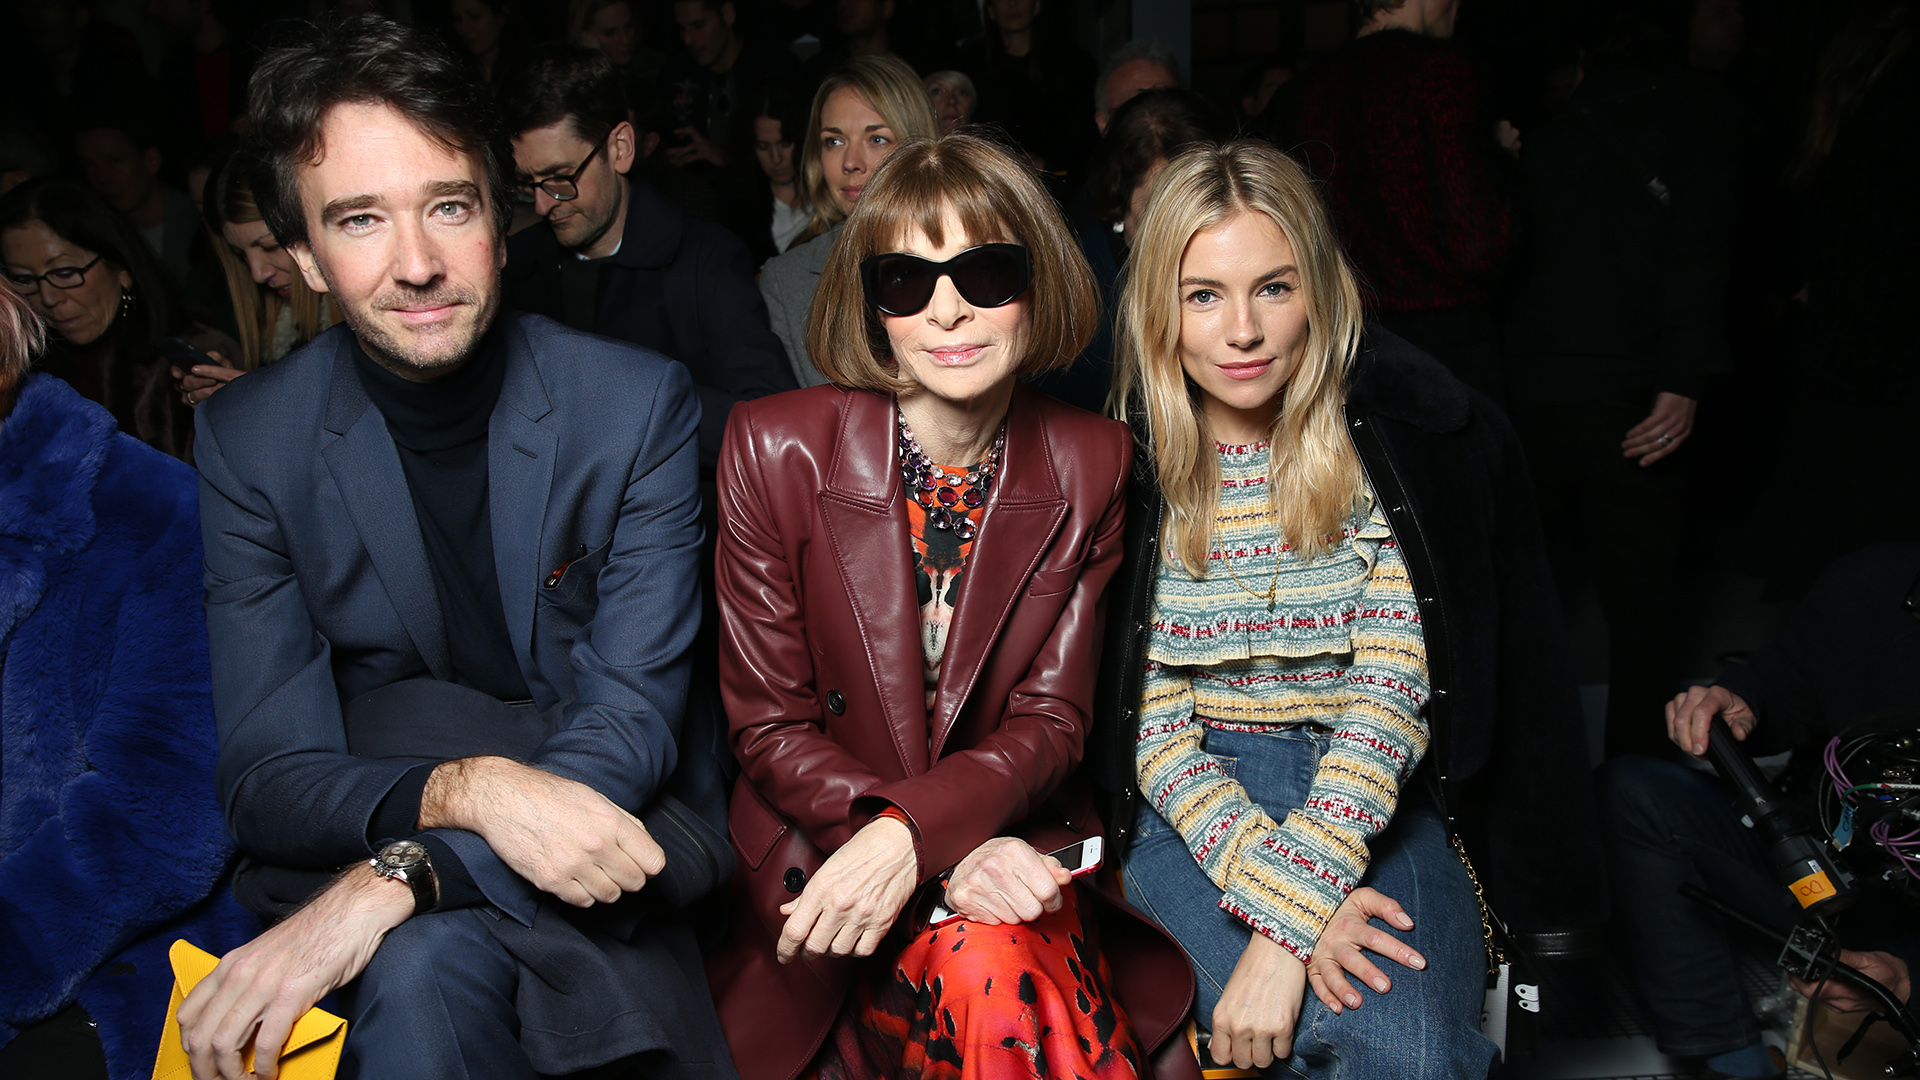 Expertos de moda: Antoine Arnault, Anna Wintour y Sienna Miller